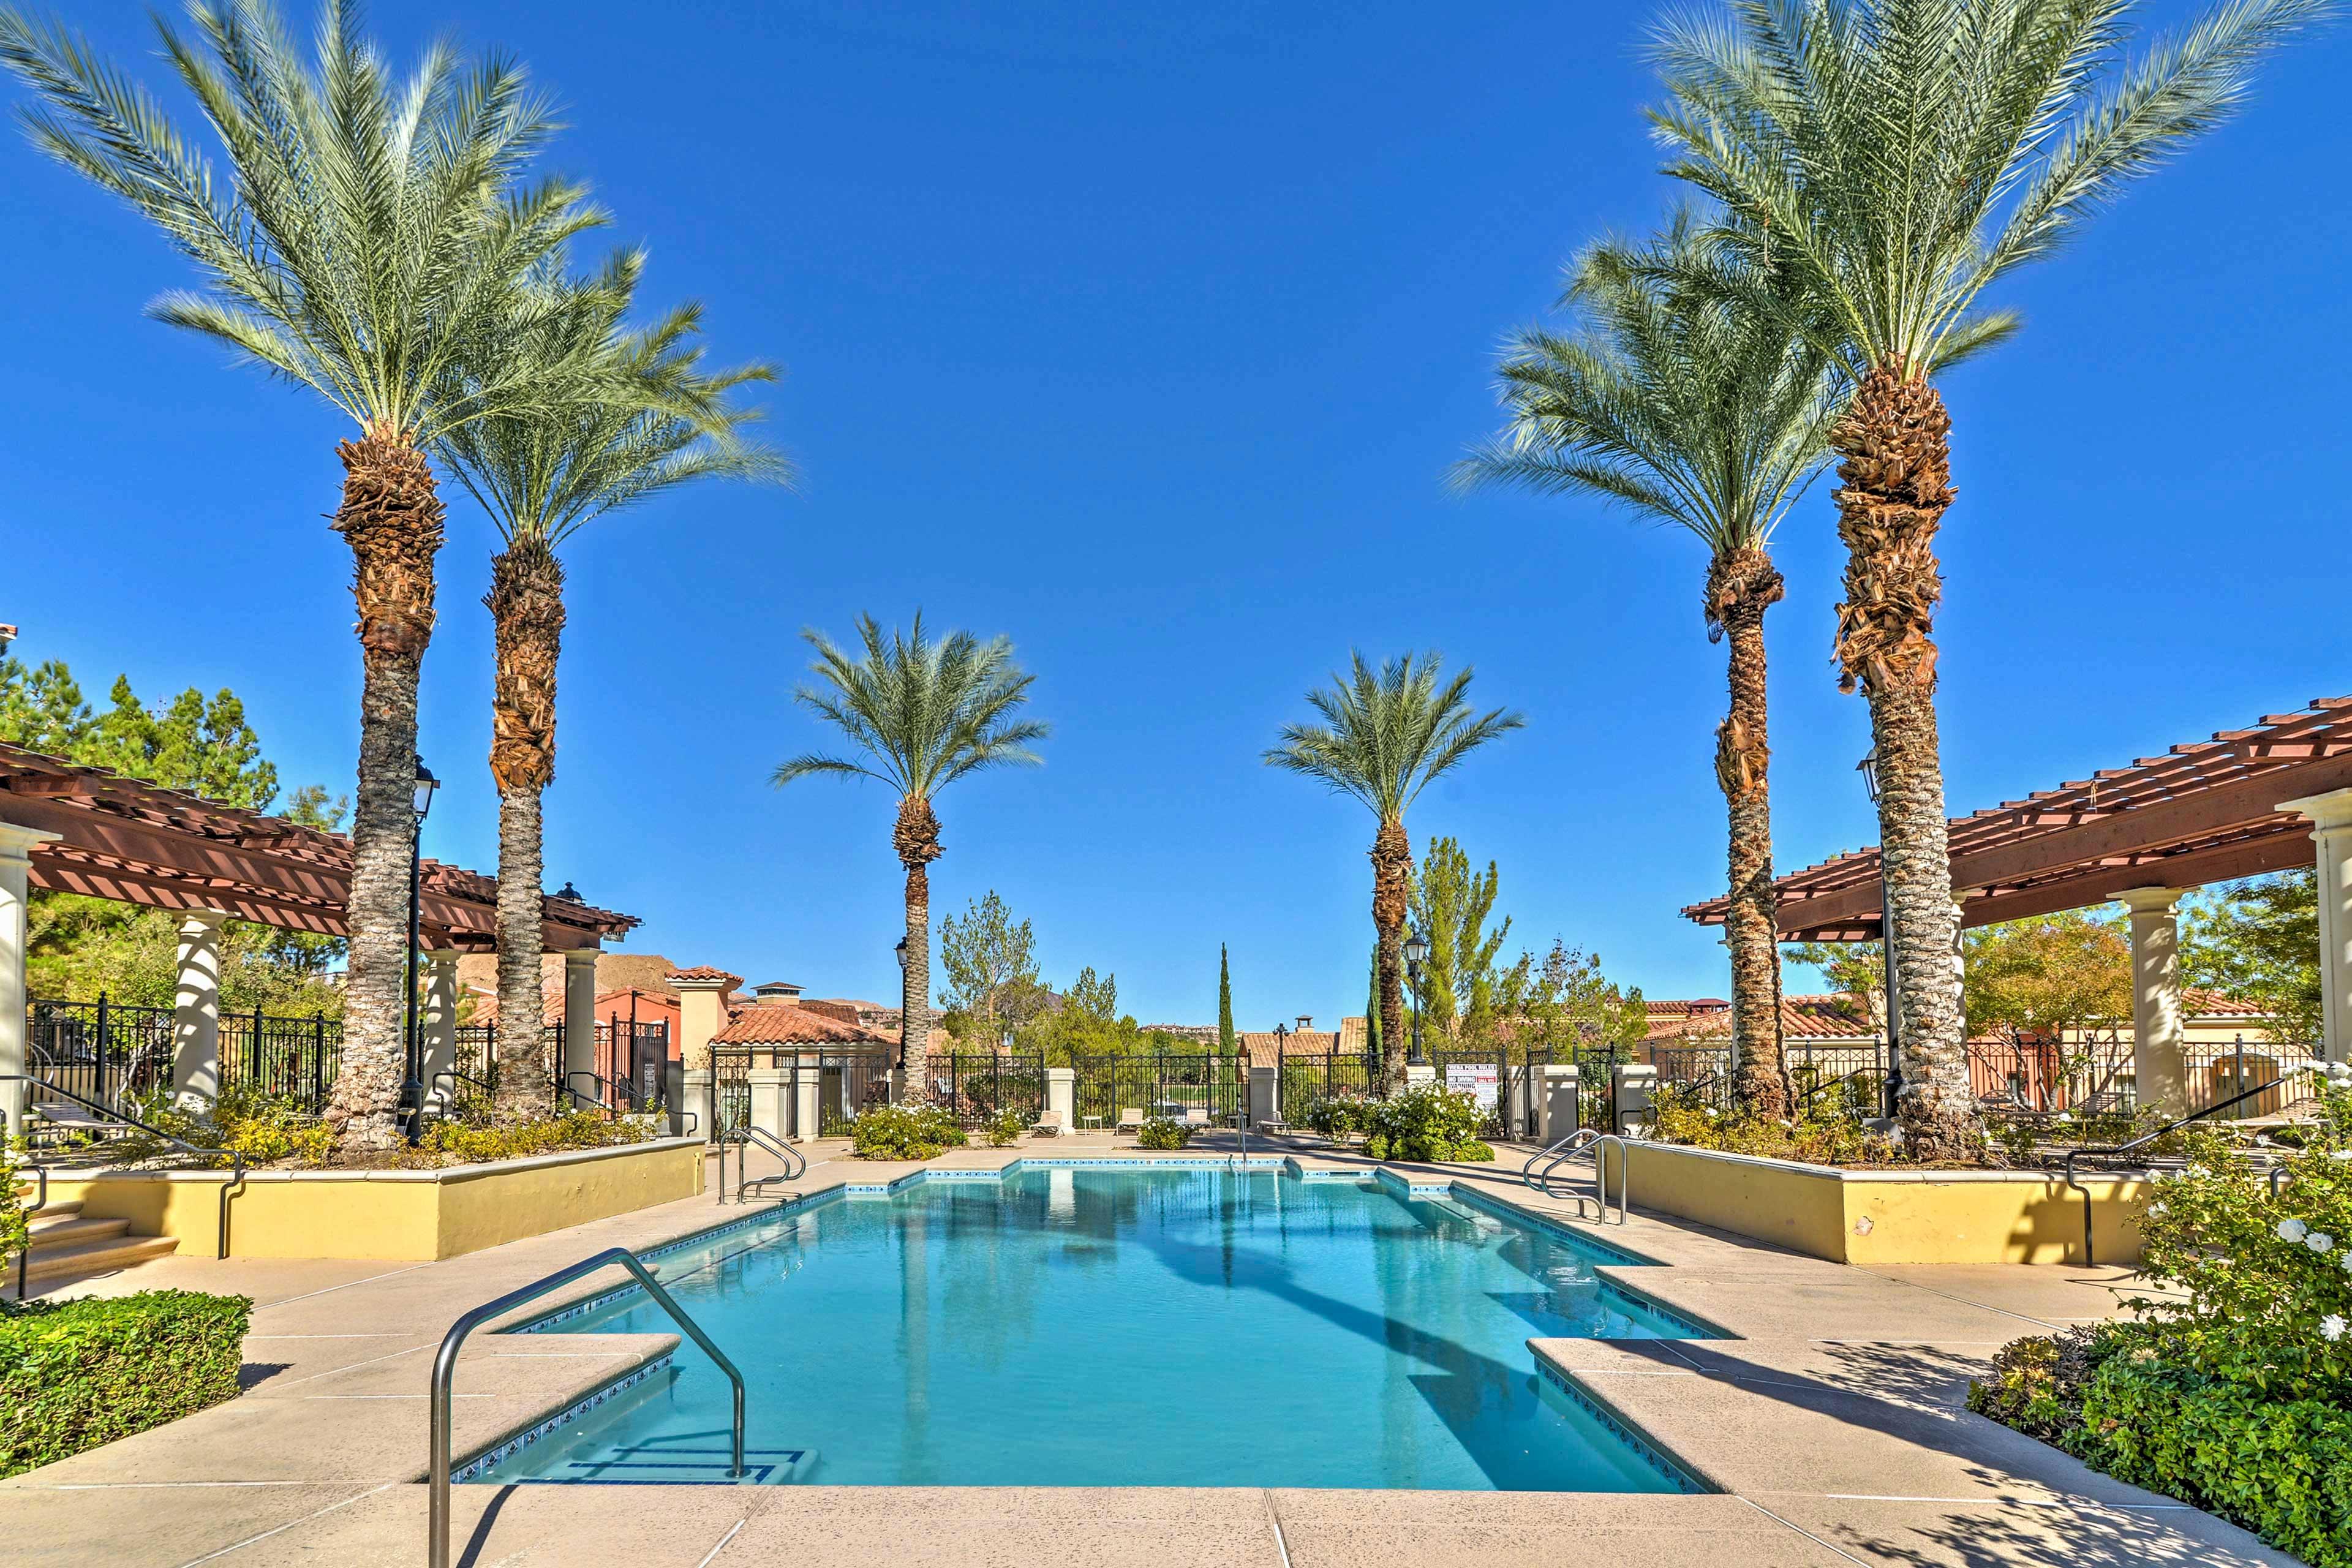 Utilize splendid resort amenities when you stay here.